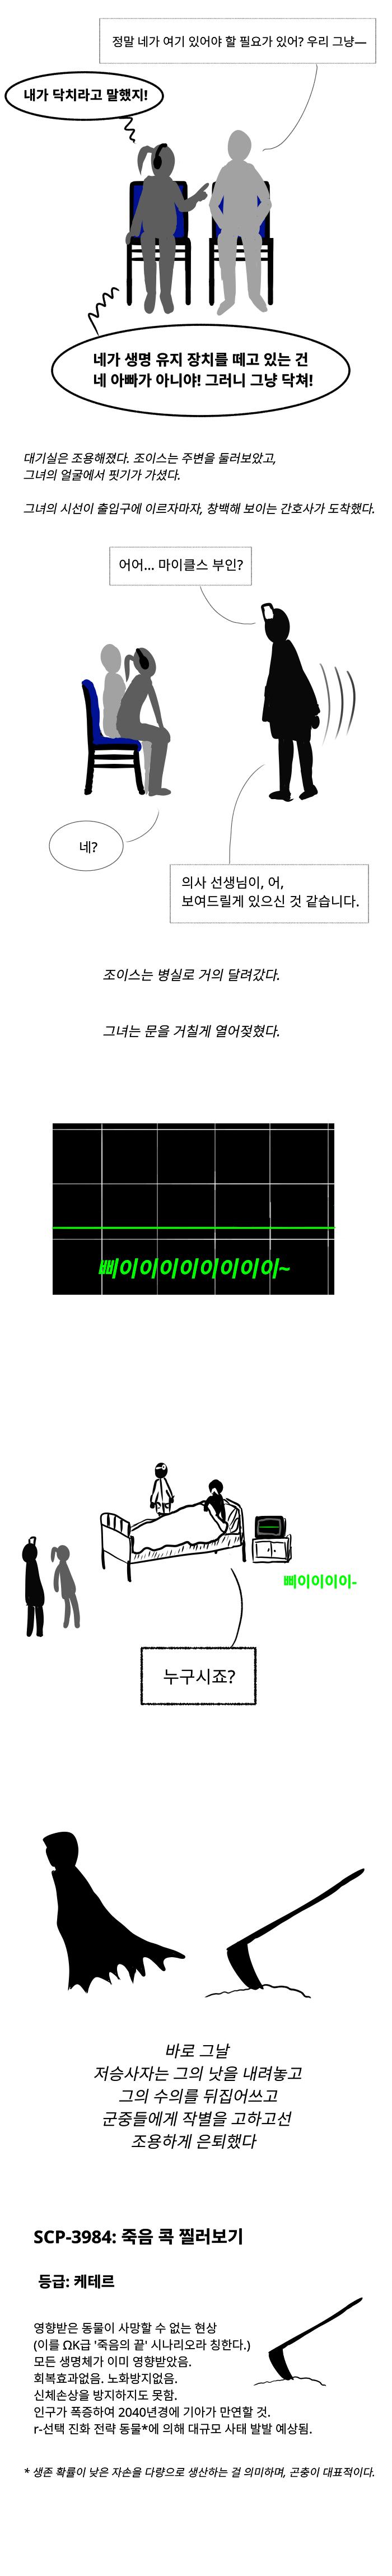 ?scode=mtistory2&fname=https%3A%2F%2Fk.kakaocdn.net%2Fdn%2FcvnnMx%2FbtqxJlqCzfz%2F8ZugPOgtBpVzM43NWA4J6K%2Fimg.png